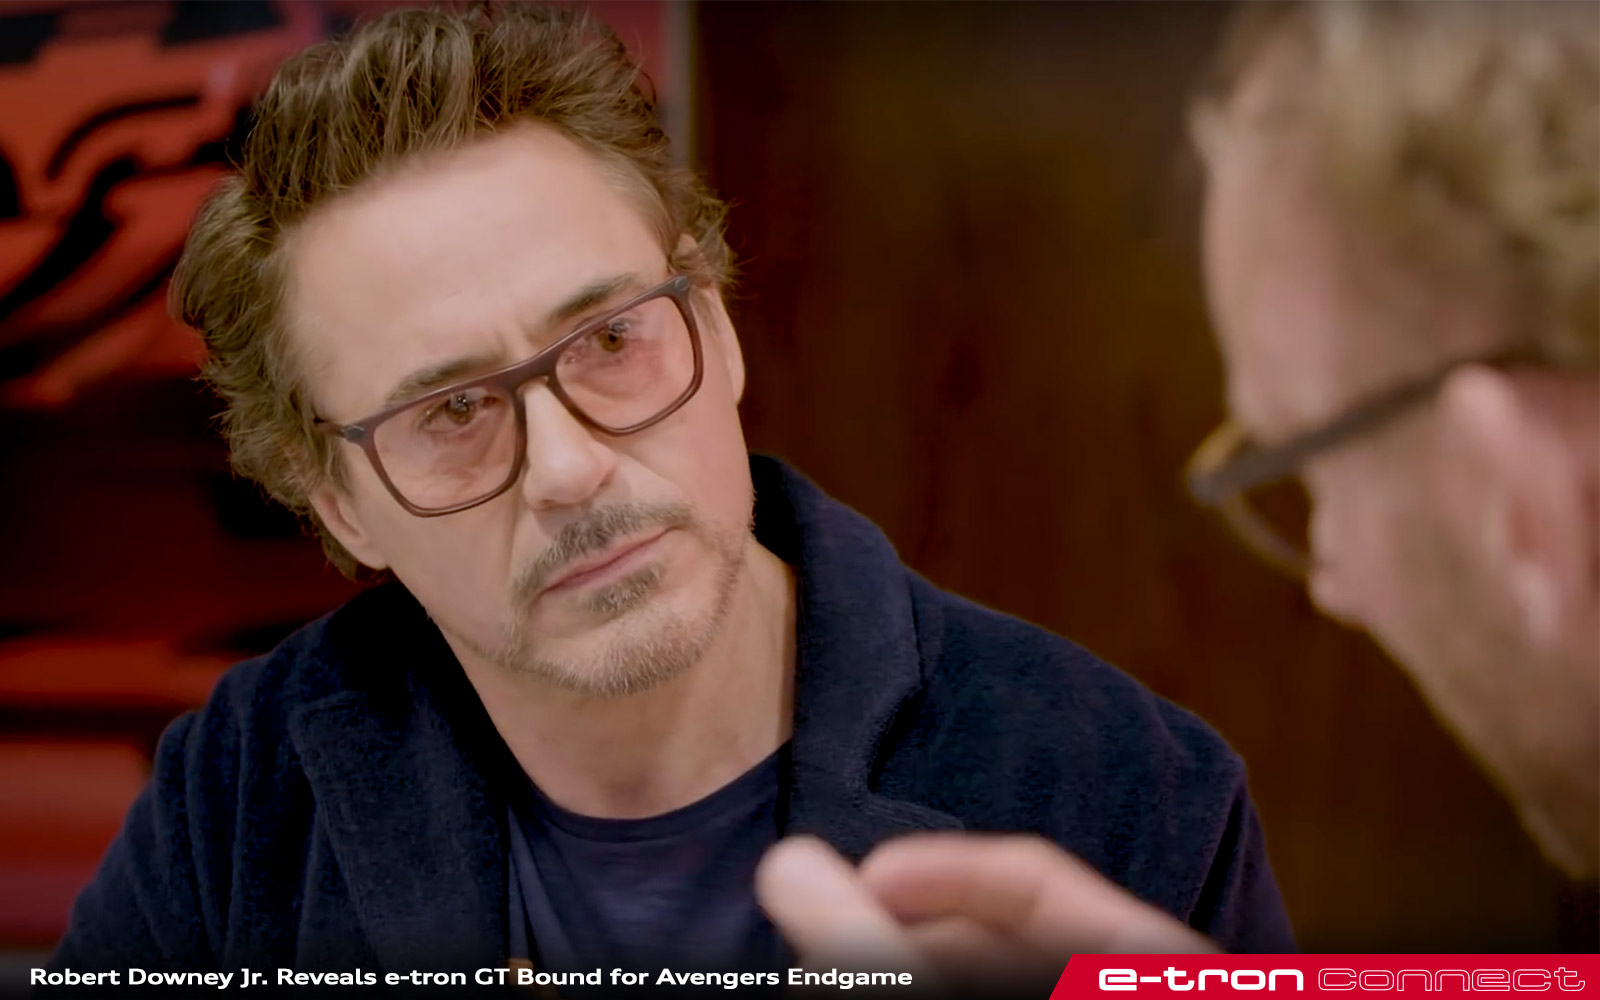 Robert Downey Jr Avengers Endgame Audi 431 E Tron Connect